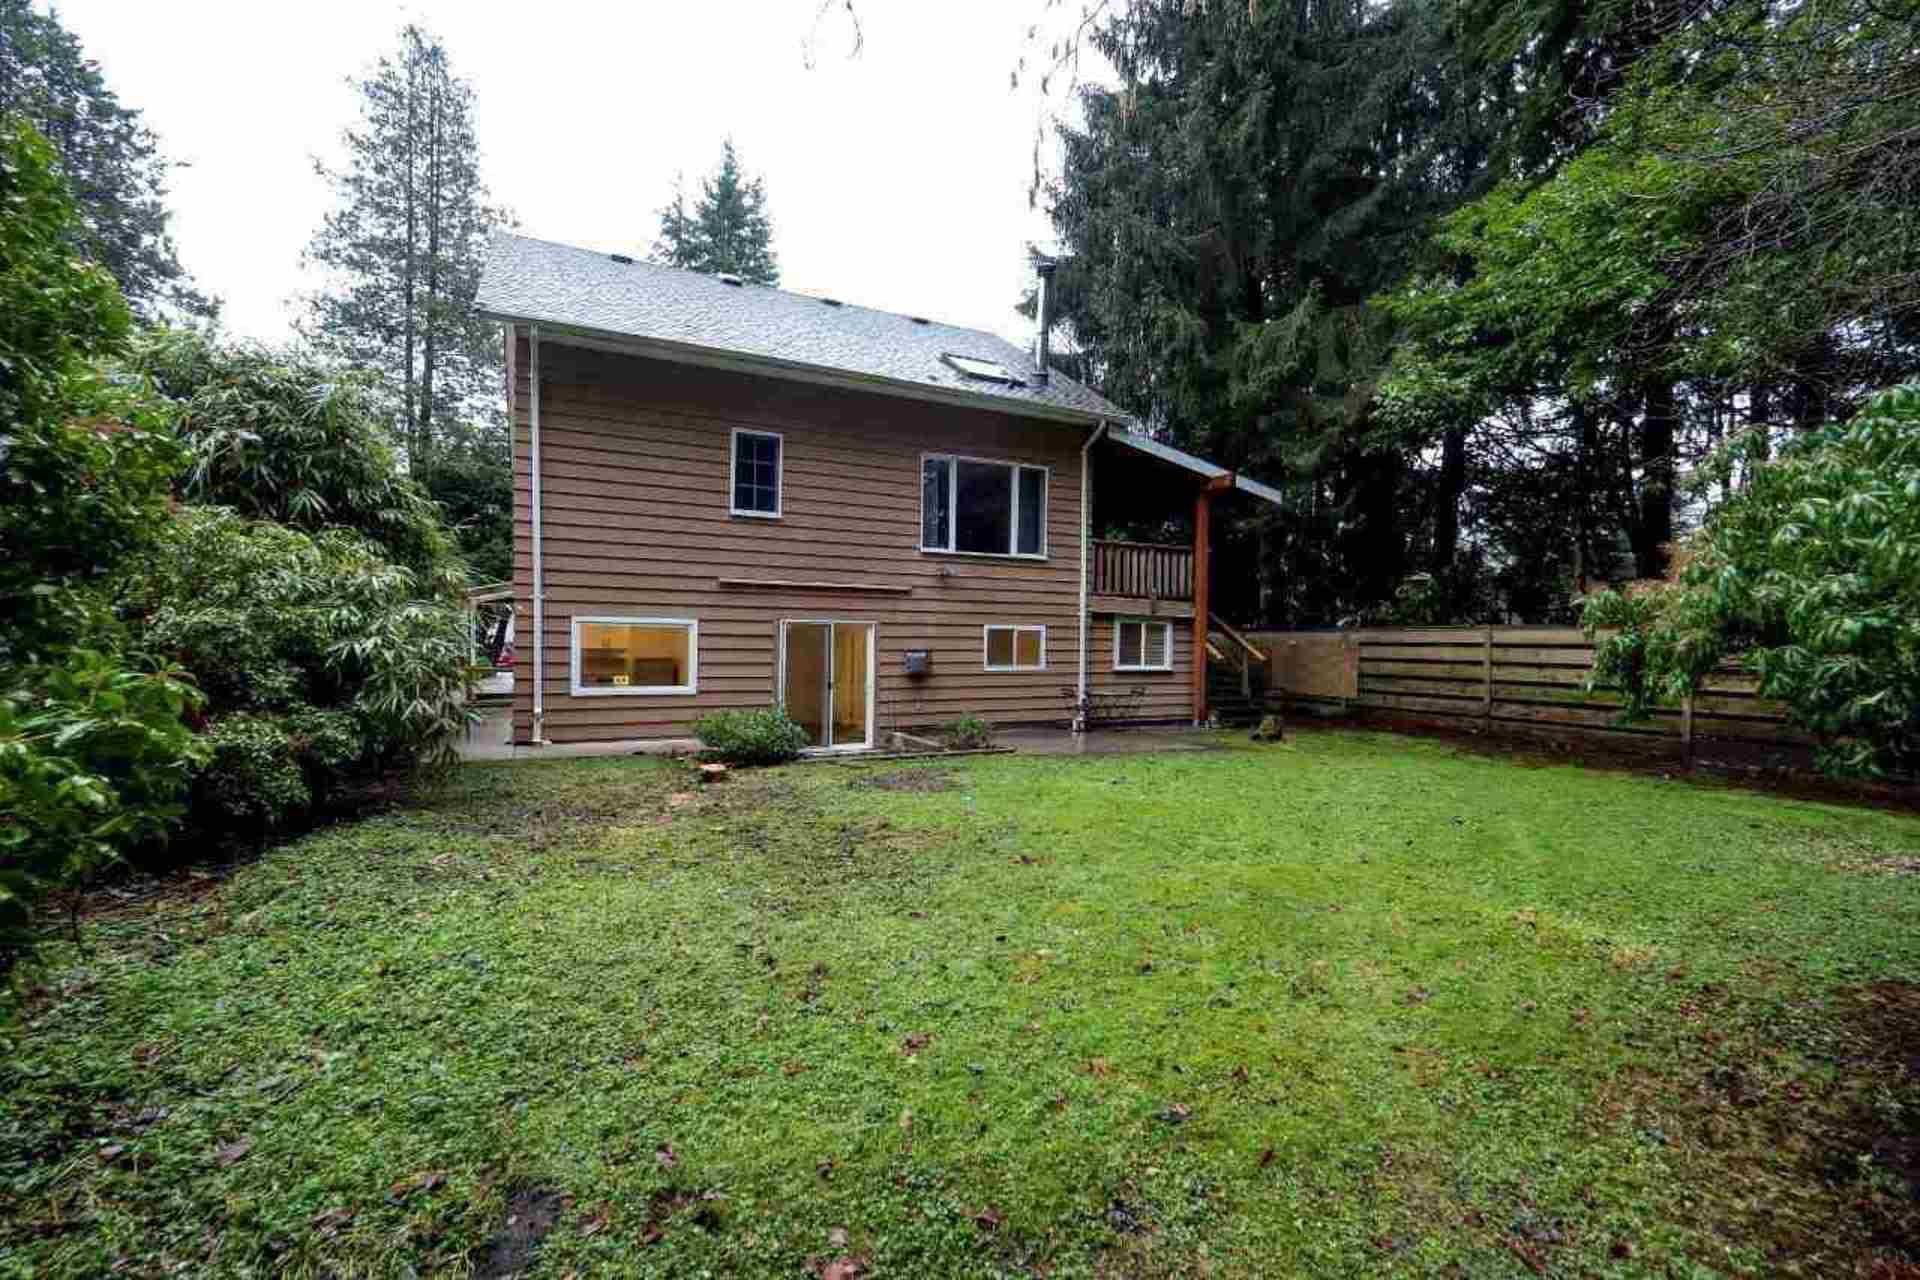 3219-allan-road-lynn-valley-north-vancouver-18 at 3219 Allan Road, Lynn Valley, North Vancouver